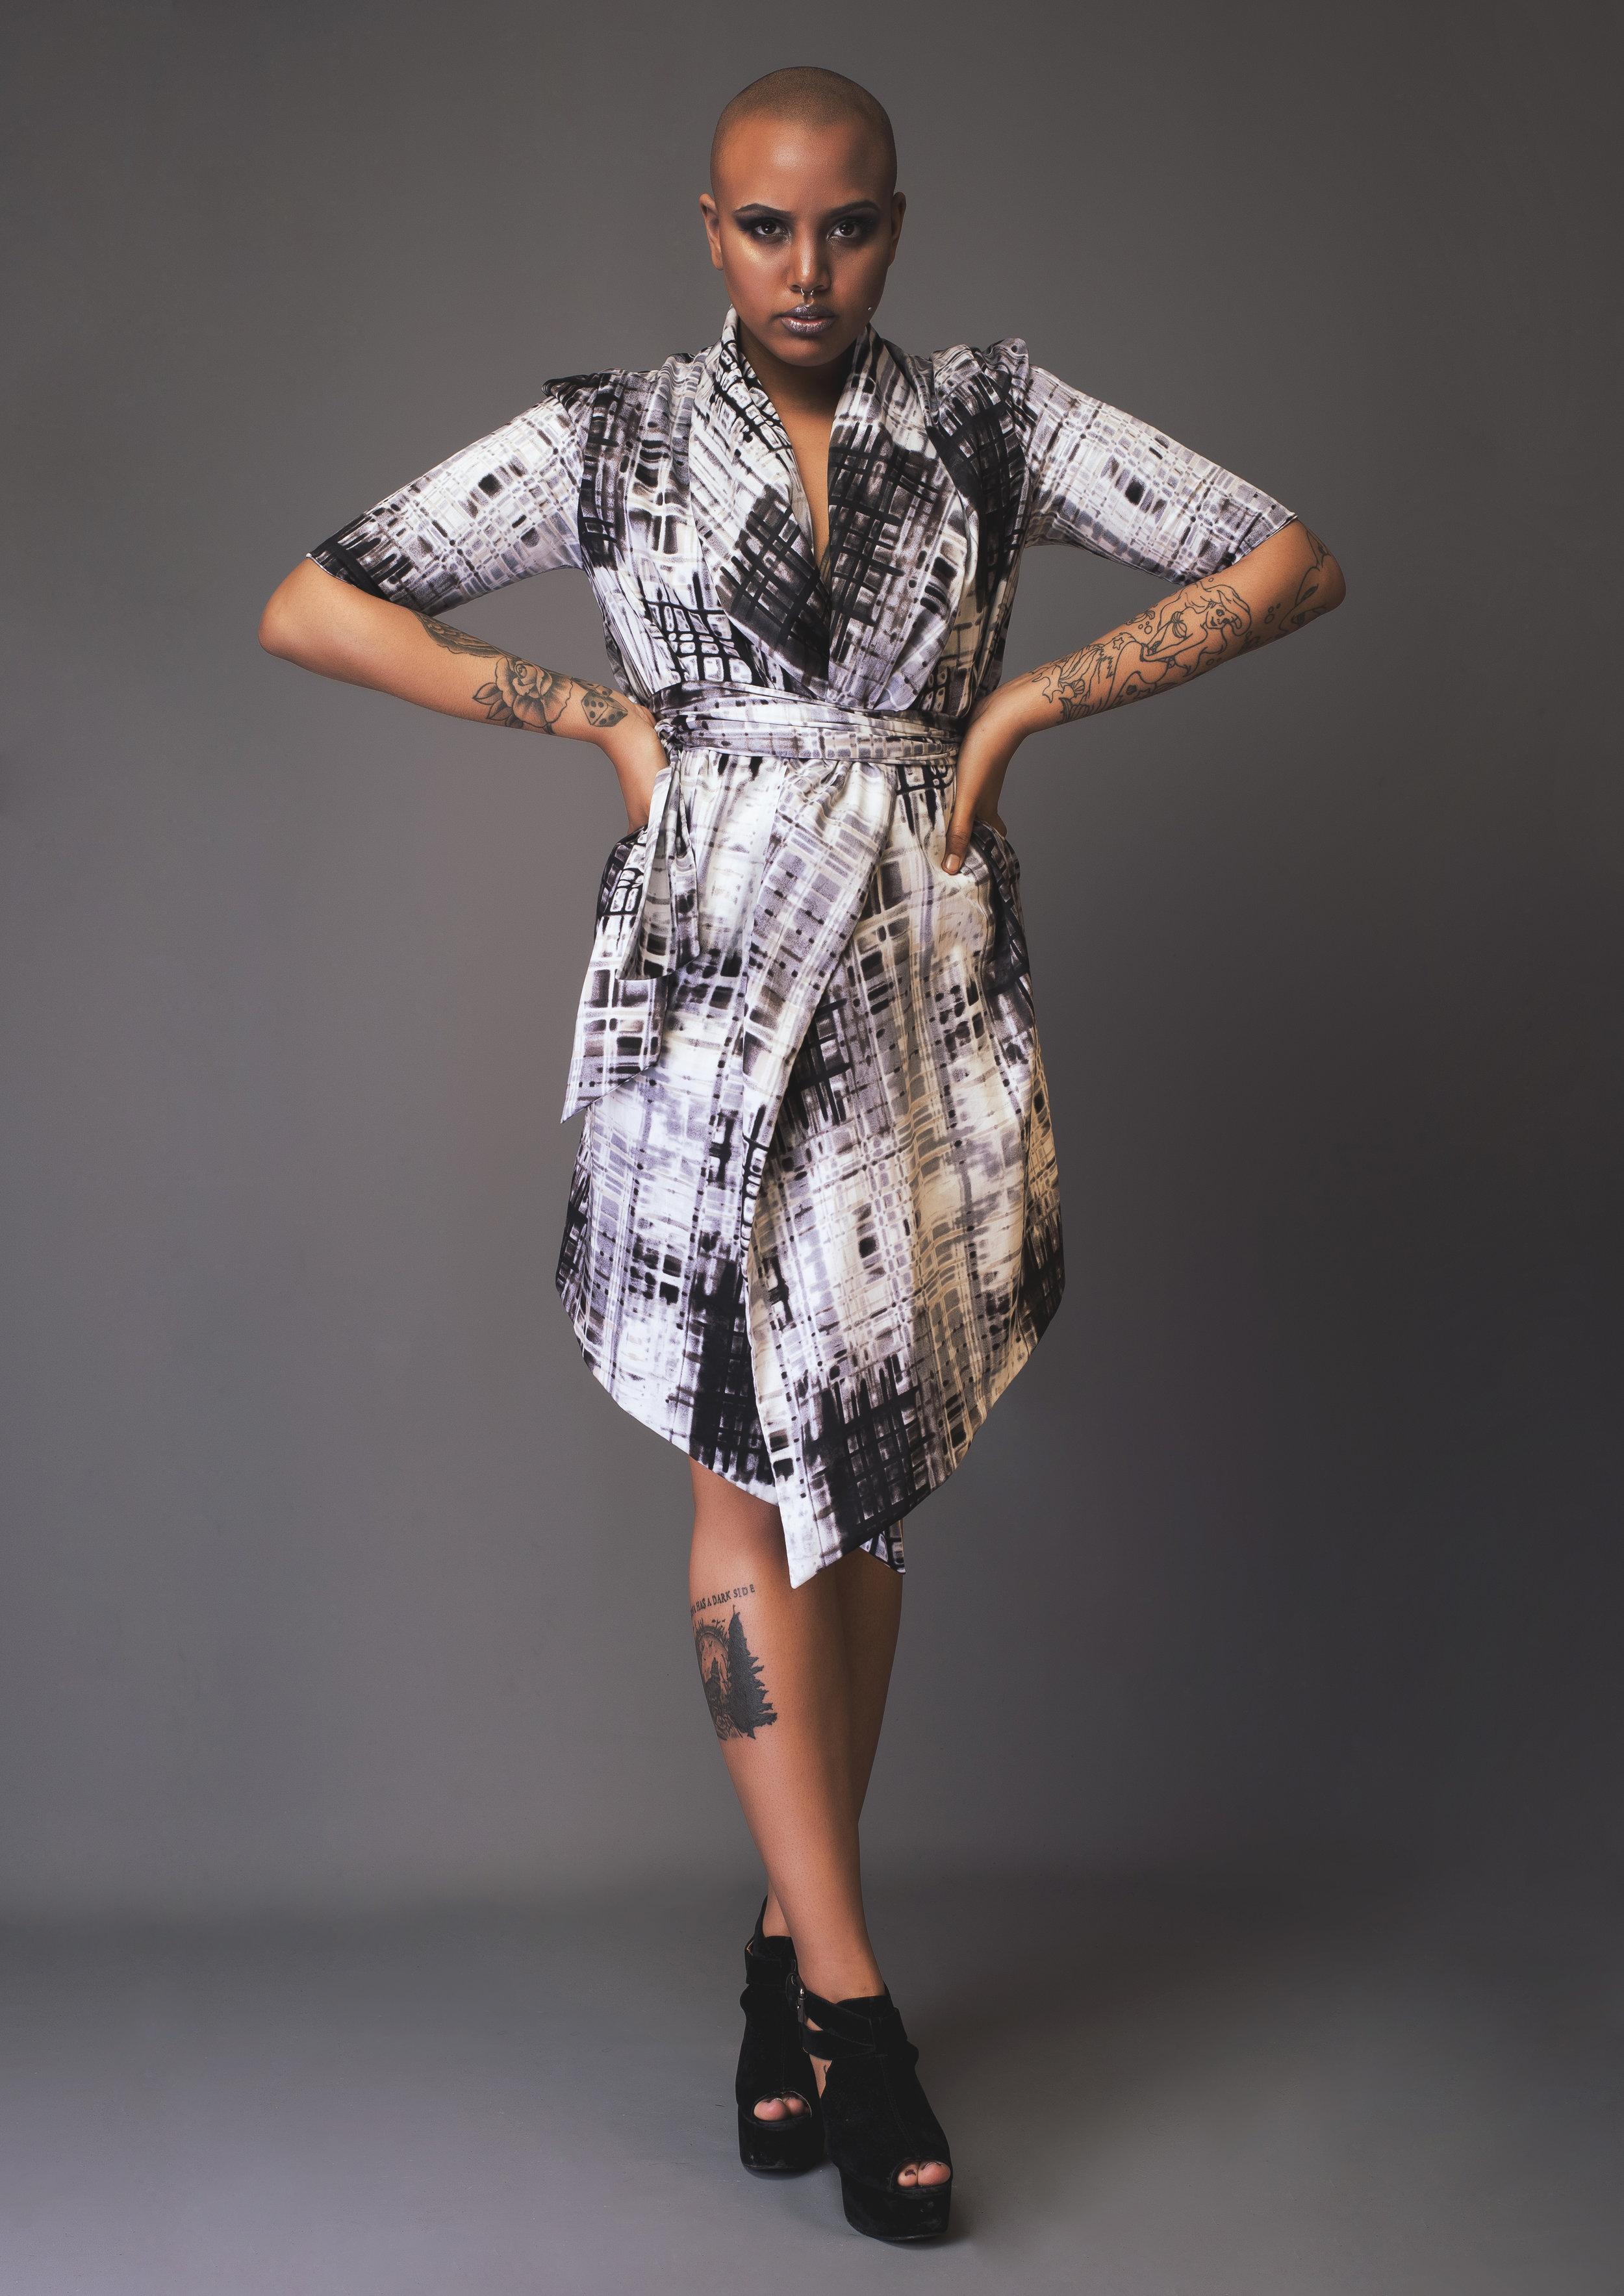 zaramia-ava-zaramiaava-leeds-fashion-designer-leedsfashiondesigner-stylist-leeds-stylist-leedsstylist-ethical-sustainable-minimalist-versatile-drape-wrap-grey-cowl-mai-dress-jacket-3